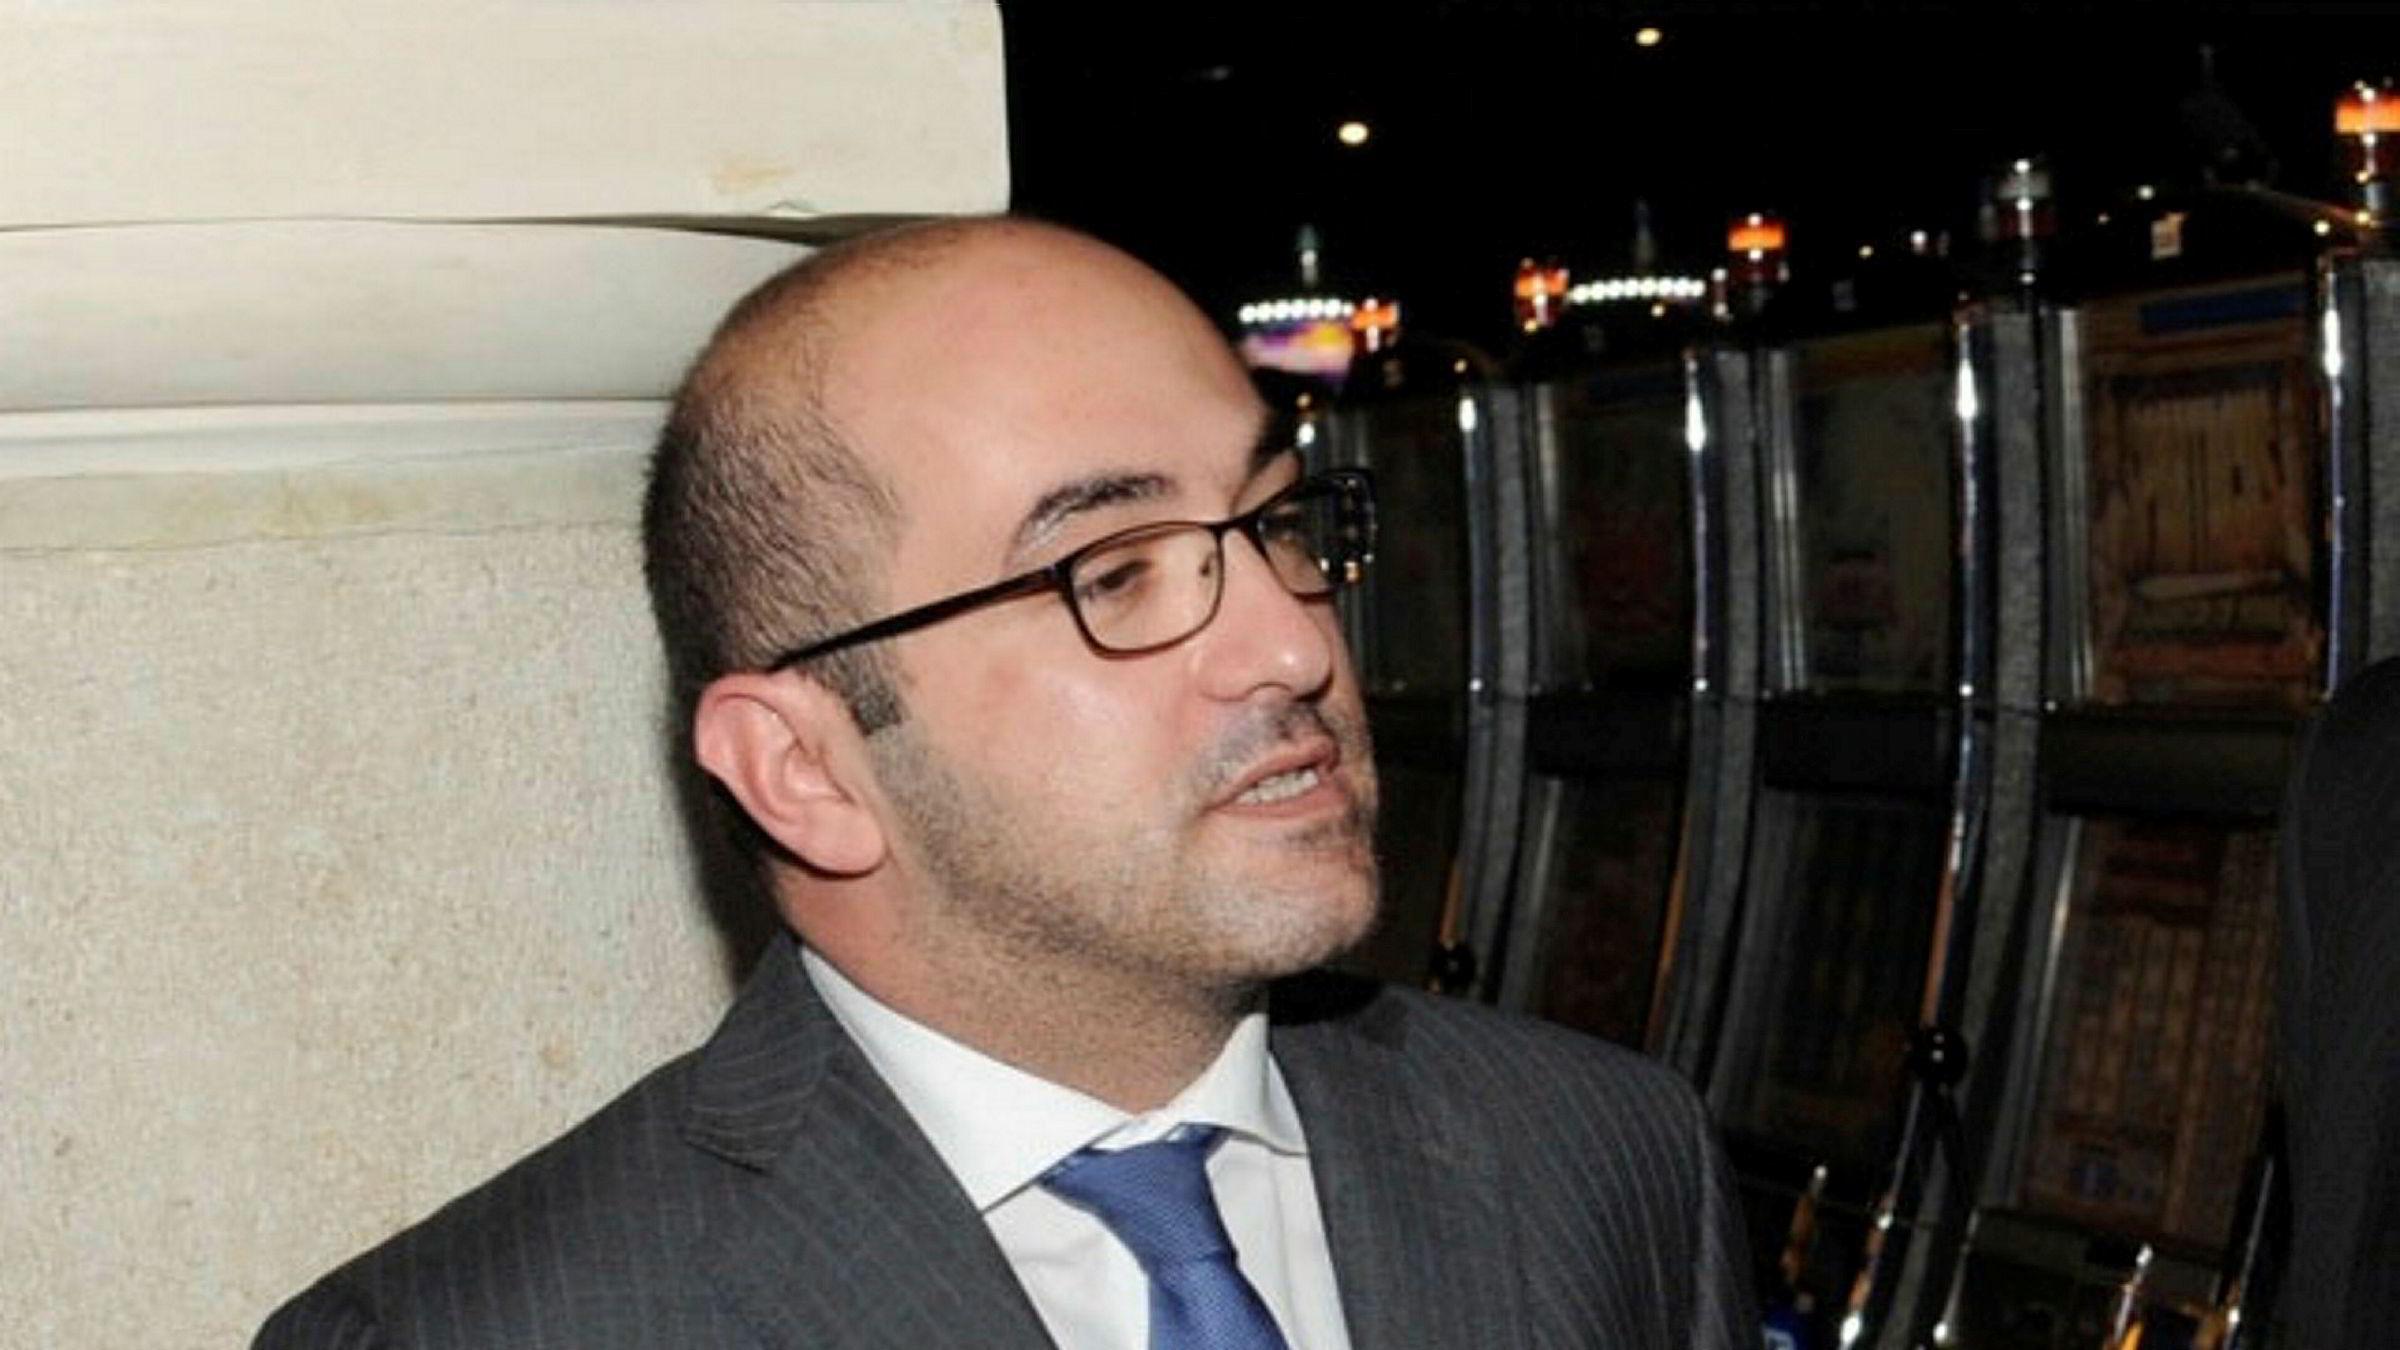 Yorgen Fenech er pågrepet i forbindelse med drapet på journalist Daphne Caruana Galizia, bilde fra 2014.